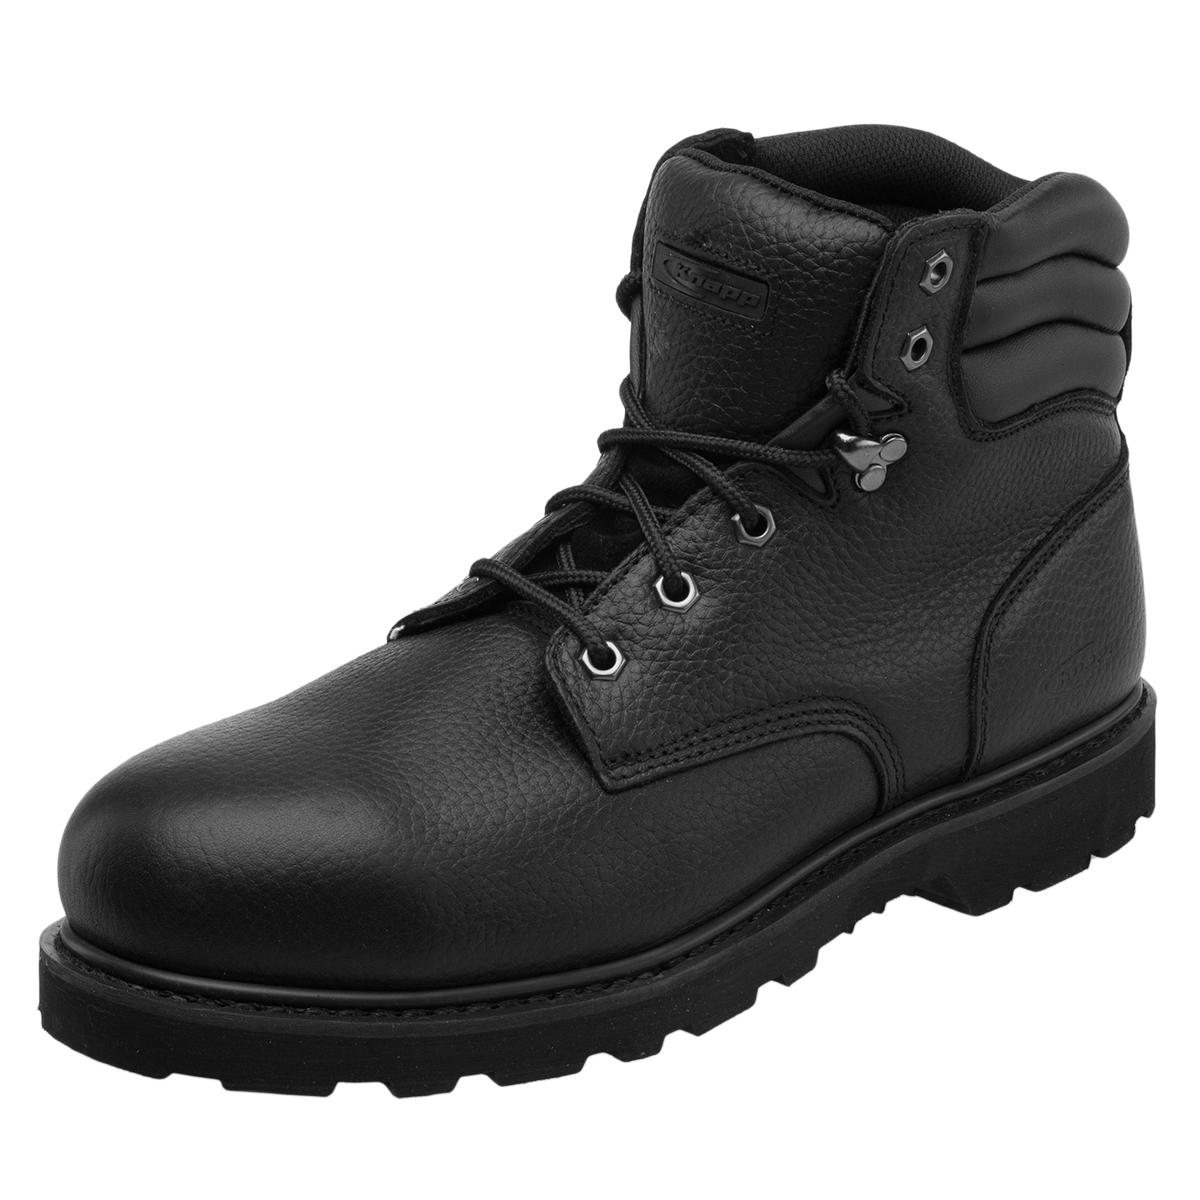 Knapp Backhoe Steel Toe Leather Mens Work Boot Construction Safety Comfort Shoes | EBay